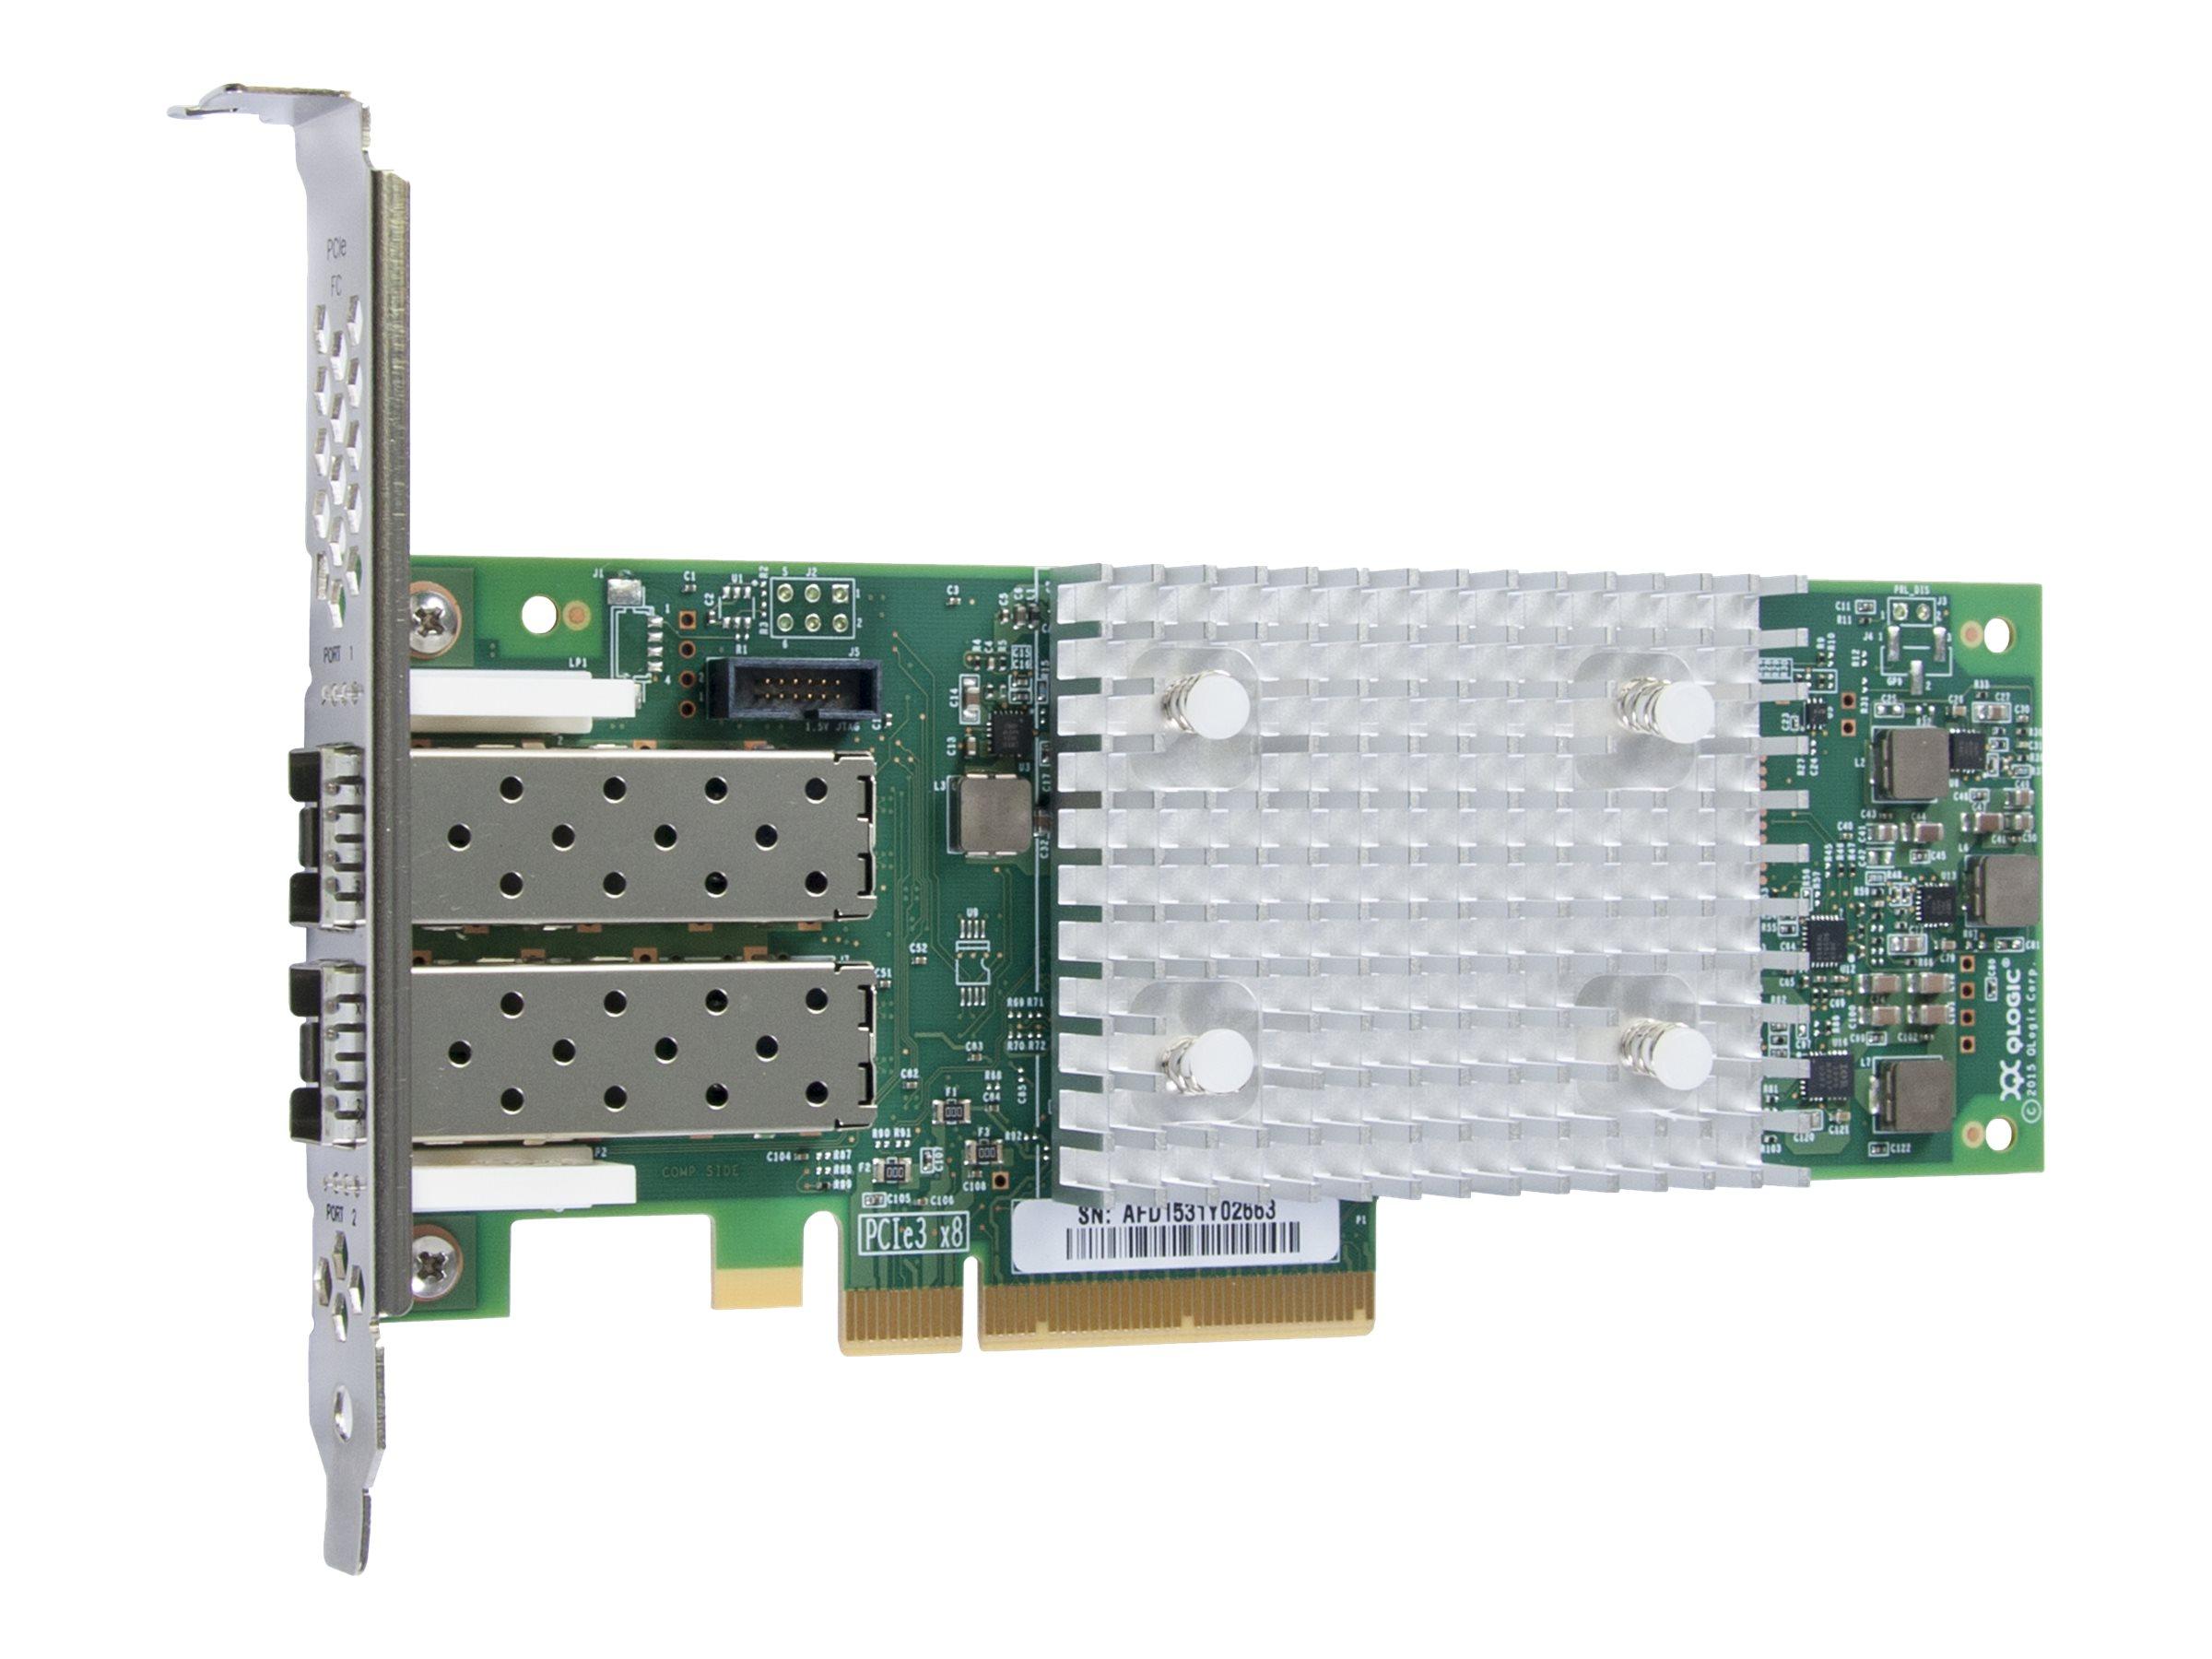 Fujitsu Qlogic QLE2692 - Hostbus-Adapter - PCIe 3.0 x8 Low-Profile